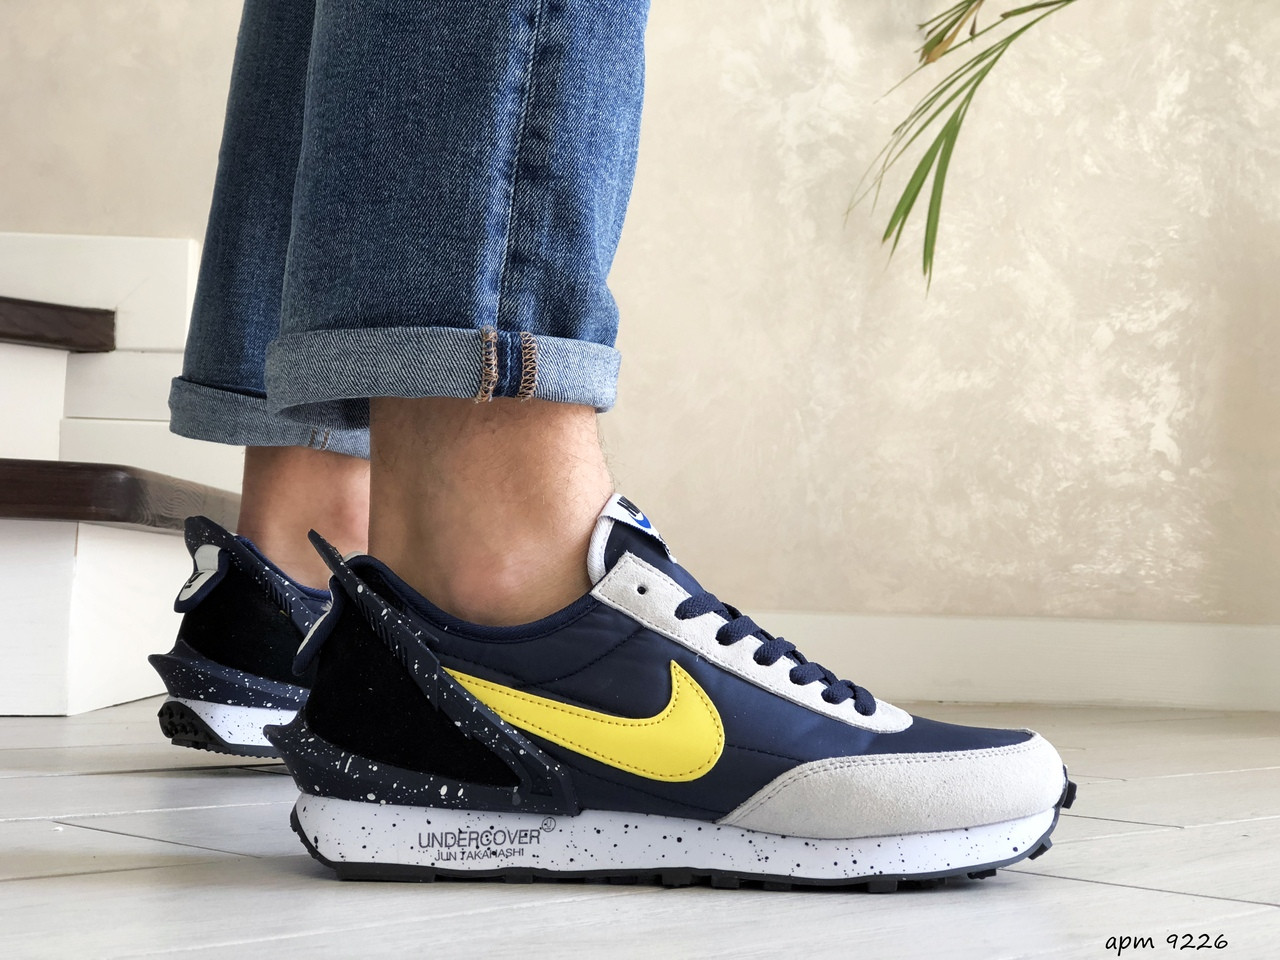 Мужские кроссовки (в стиле) Nike Undercover Jun Takahashi,темно синие с желтым